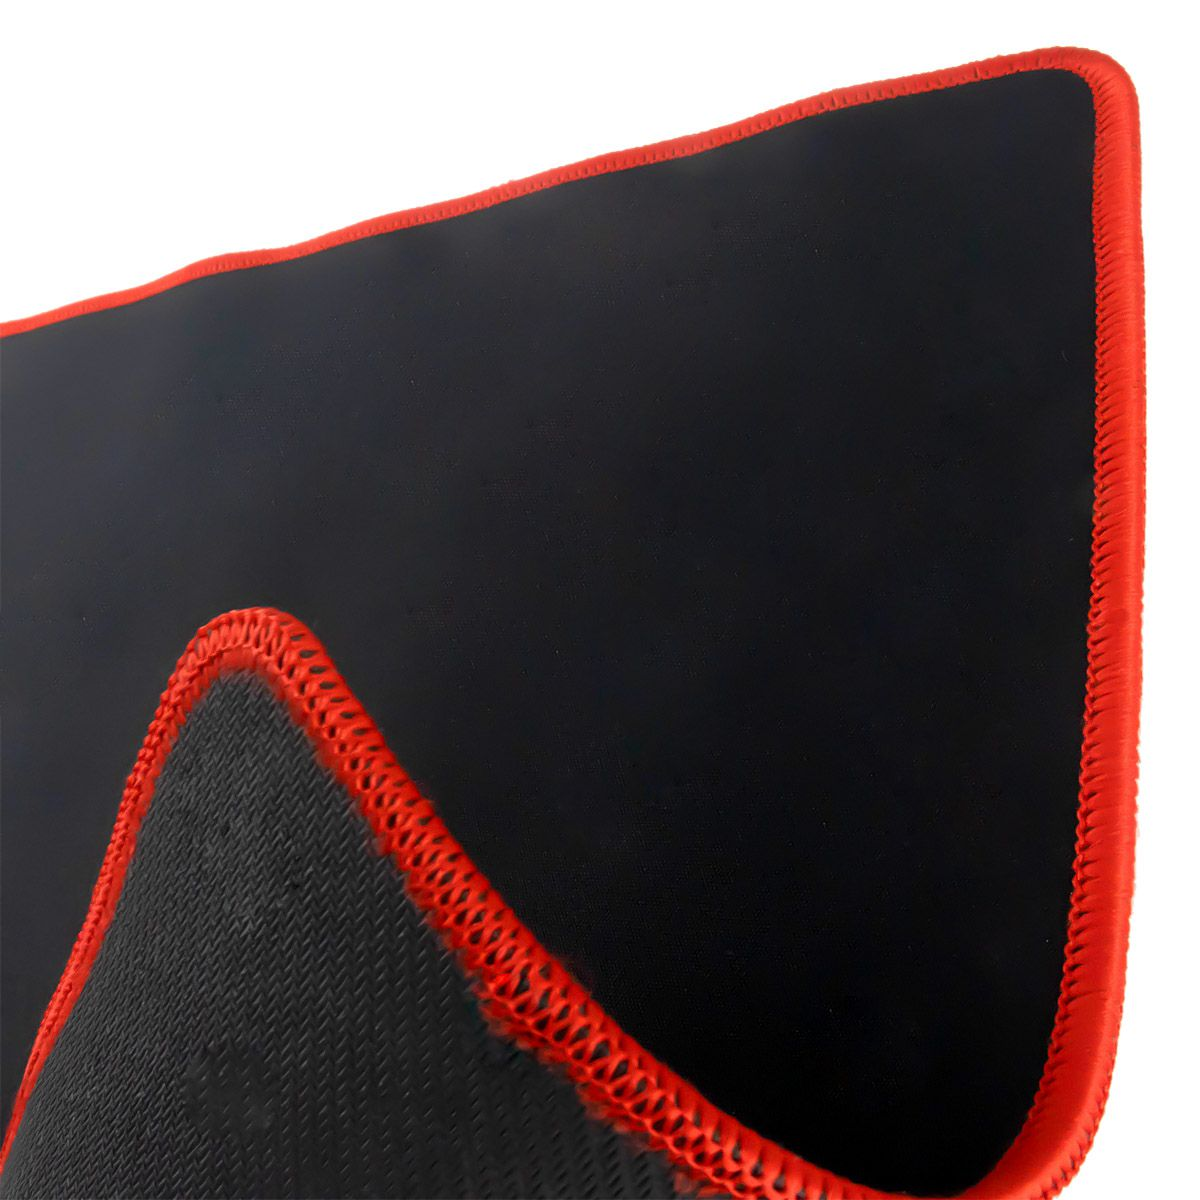 KIT 3x Mouse Pad Gamer Preto Xtrad XD-X10 Extra Grande 70x30cm